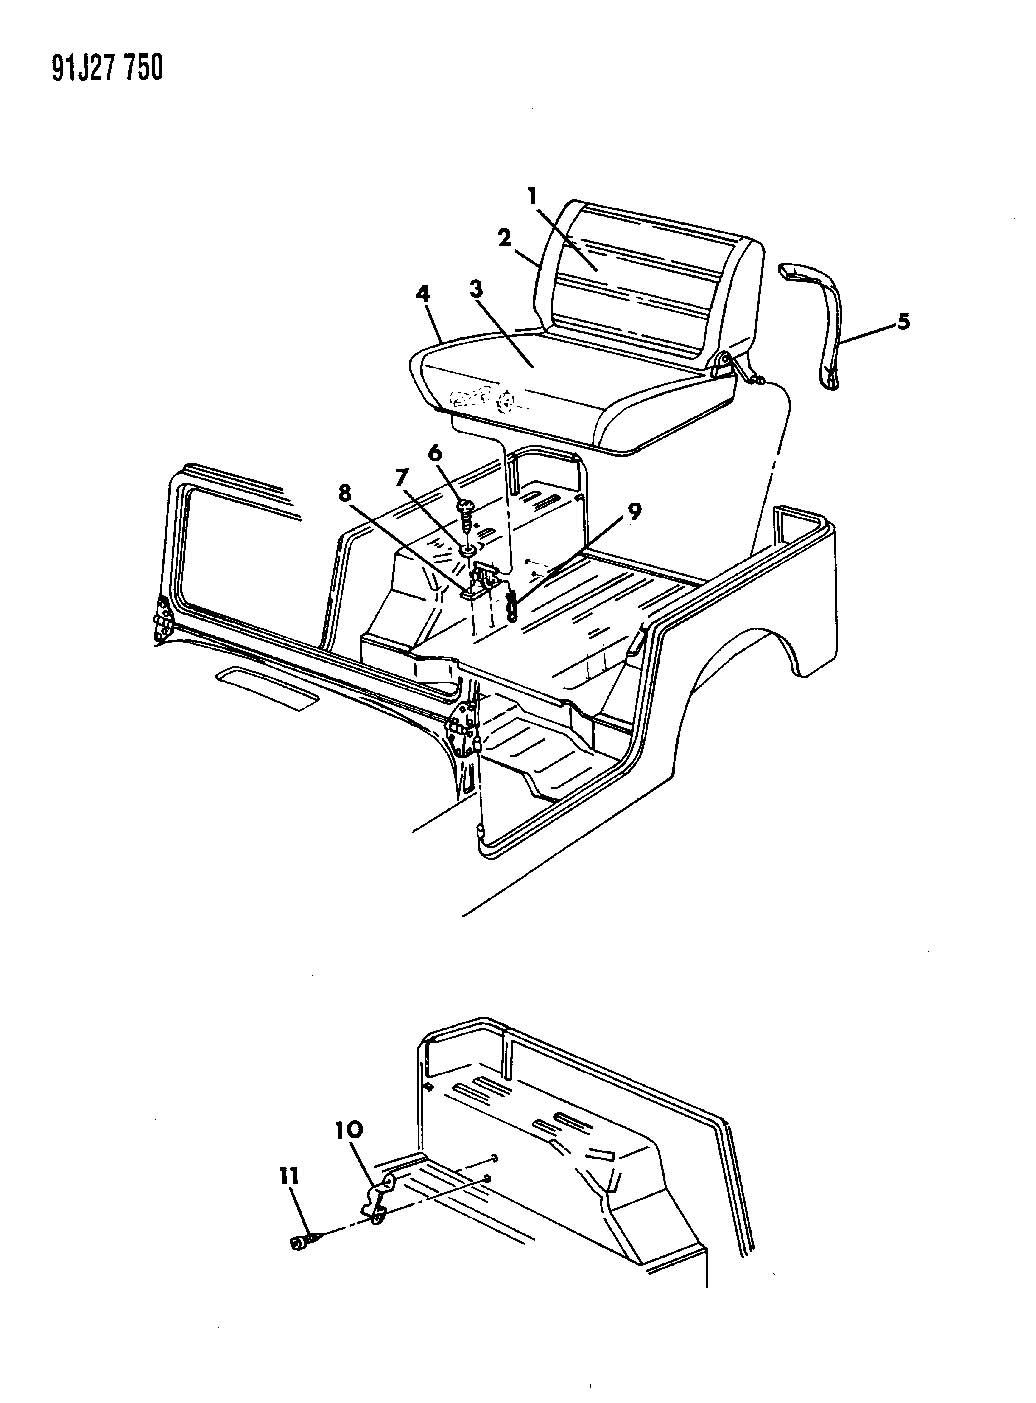 Jeep Wrangler Tj Penger Seat Parts Diagram. Seat. Auto